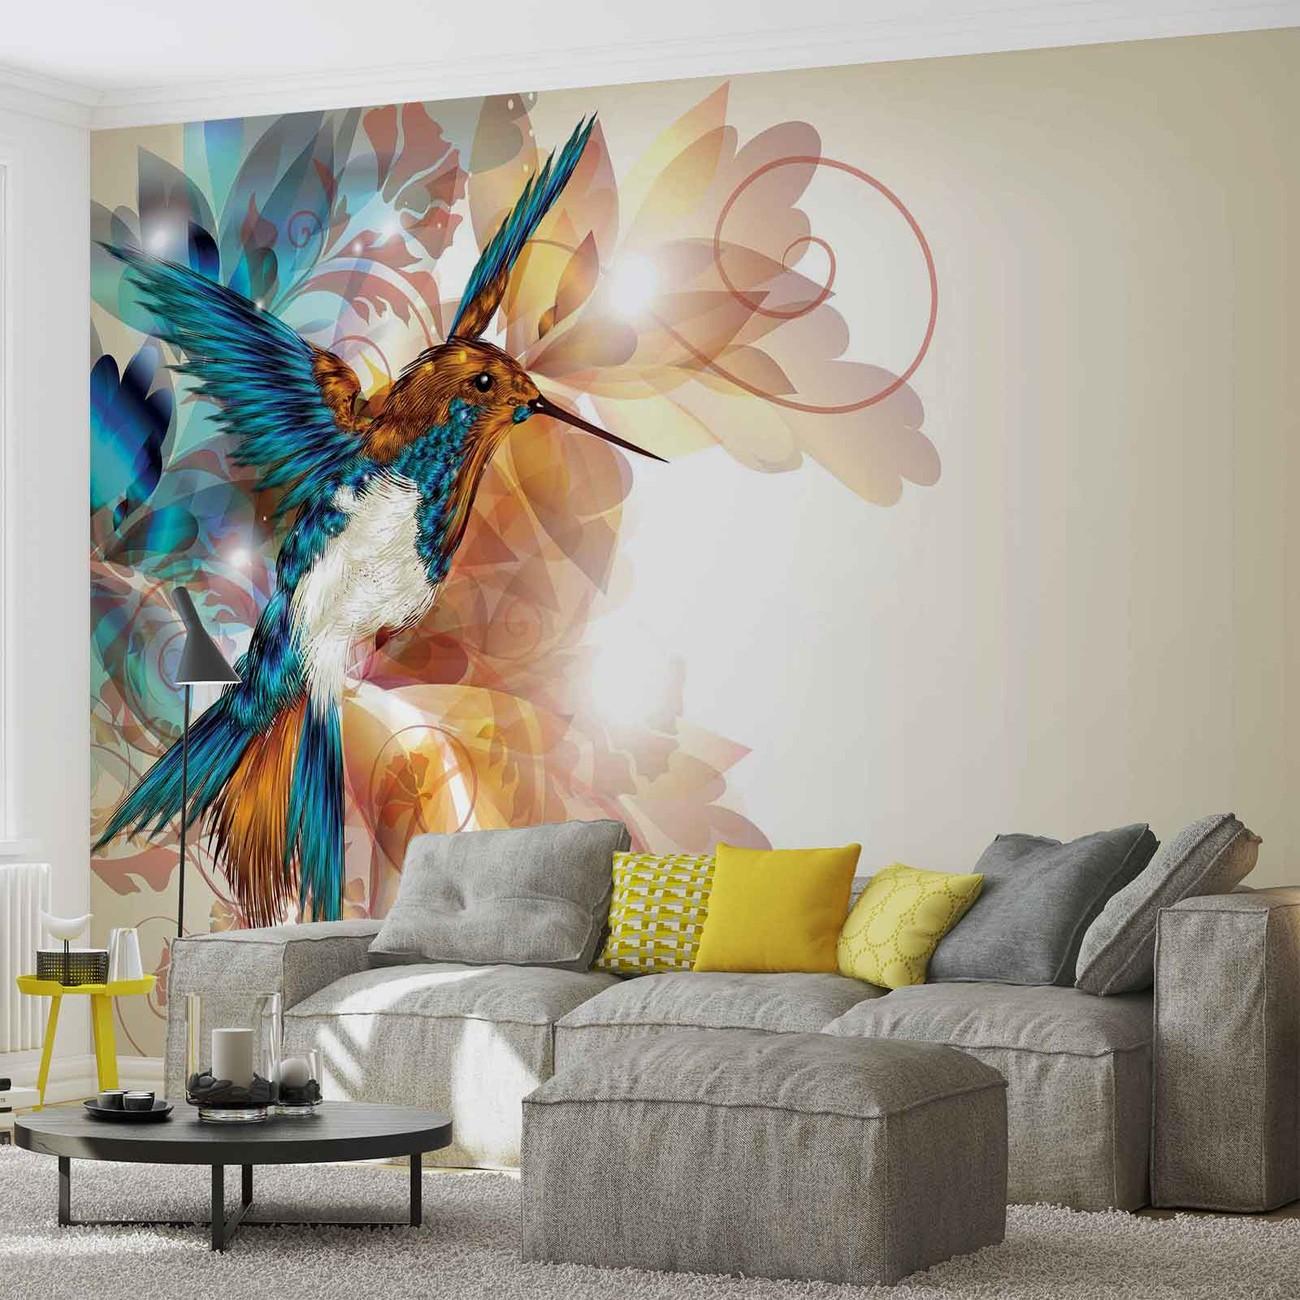 fototapete tapete v gel kolibri blumen abstrakt bei europosters kostenloser versand. Black Bedroom Furniture Sets. Home Design Ideas